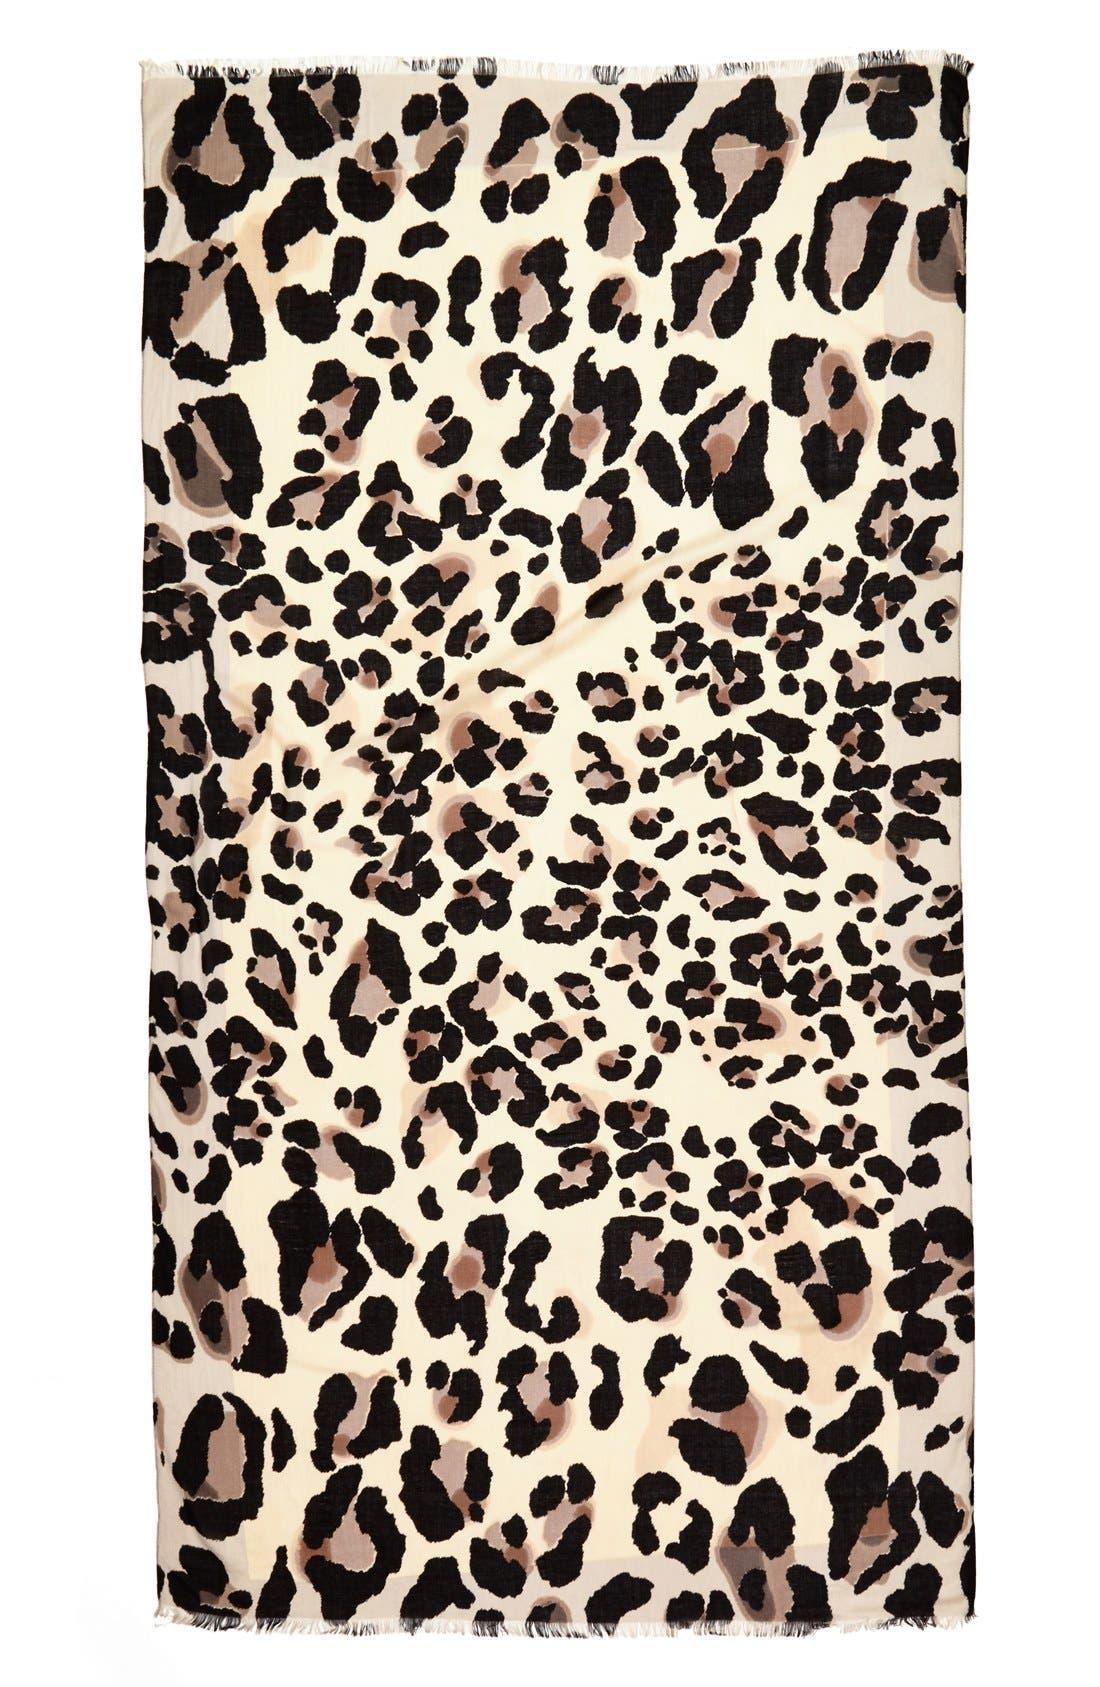 VINCE CAMUTO,                             'Cheetah Calling' Wrap,                             Alternate thumbnail 2, color,                             001